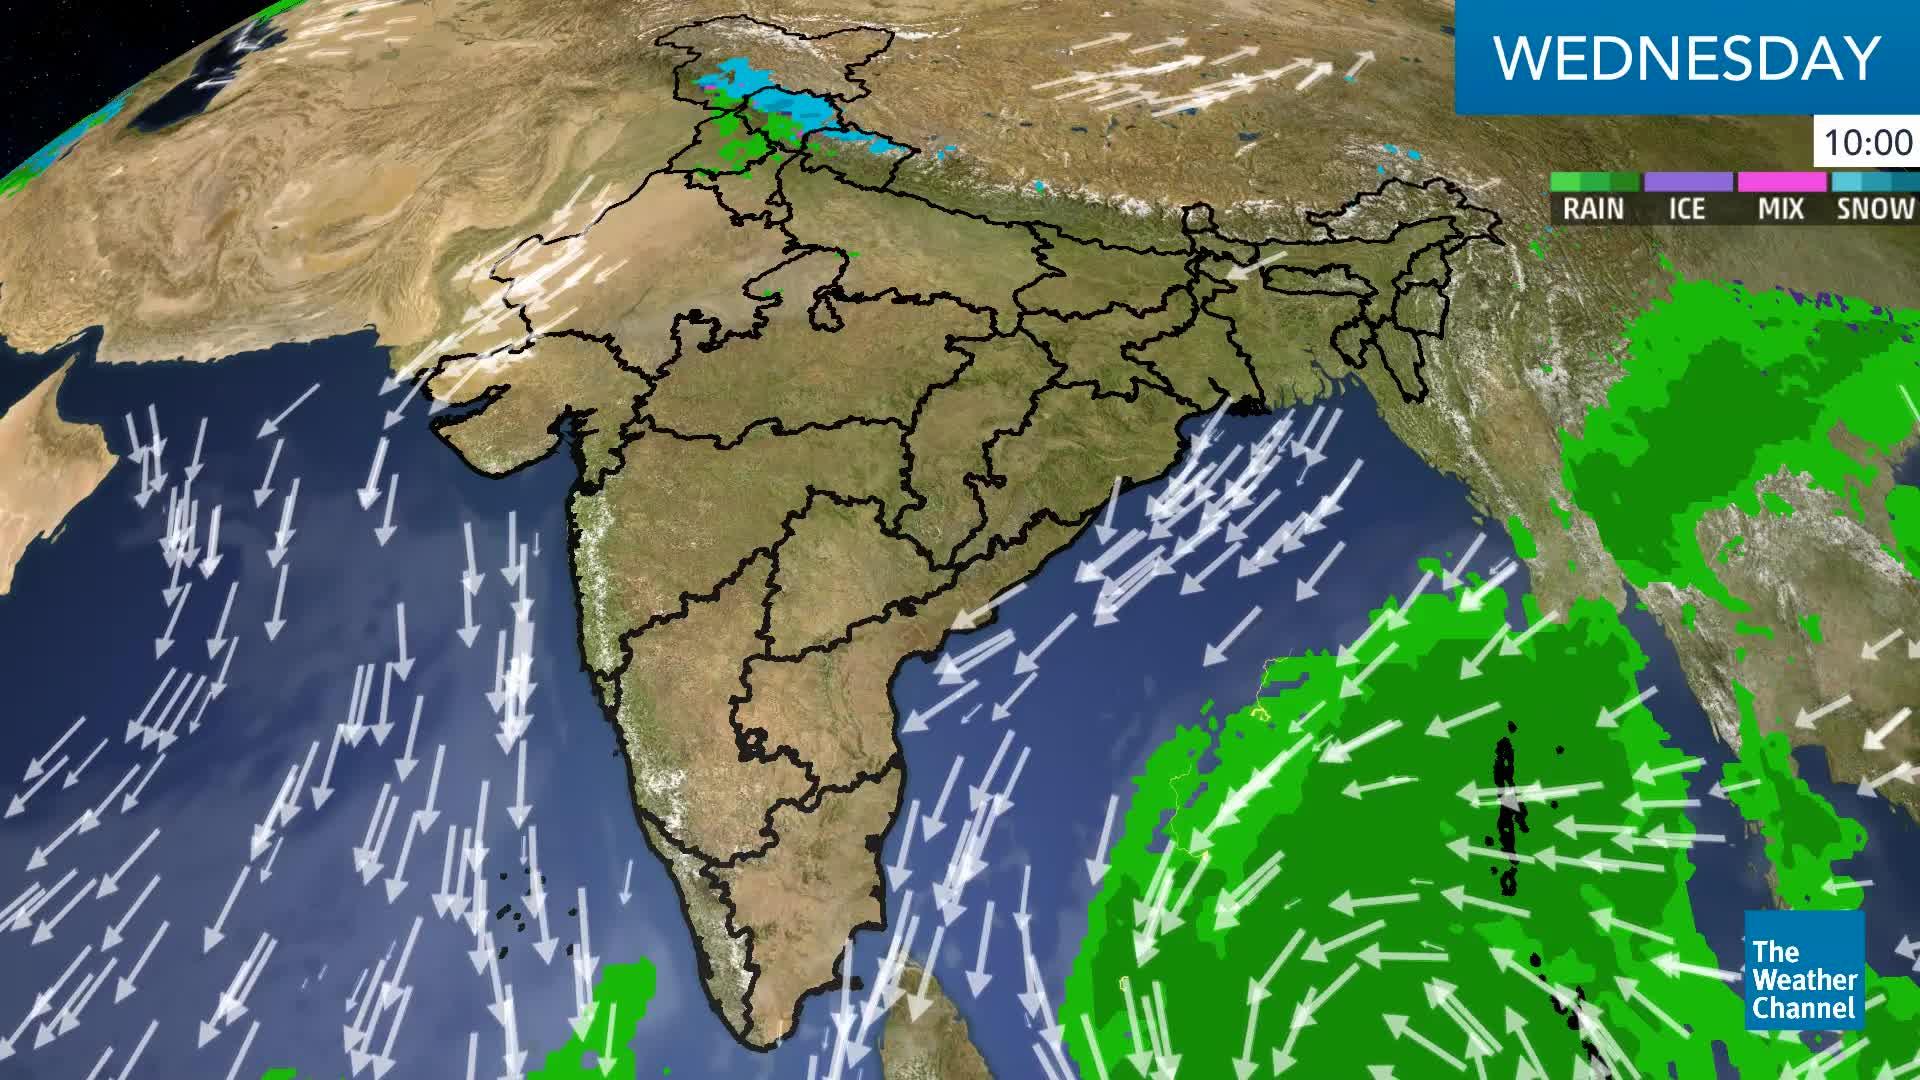 Western Disturbance Brings Snow, Rain to Northwest Himalayan States